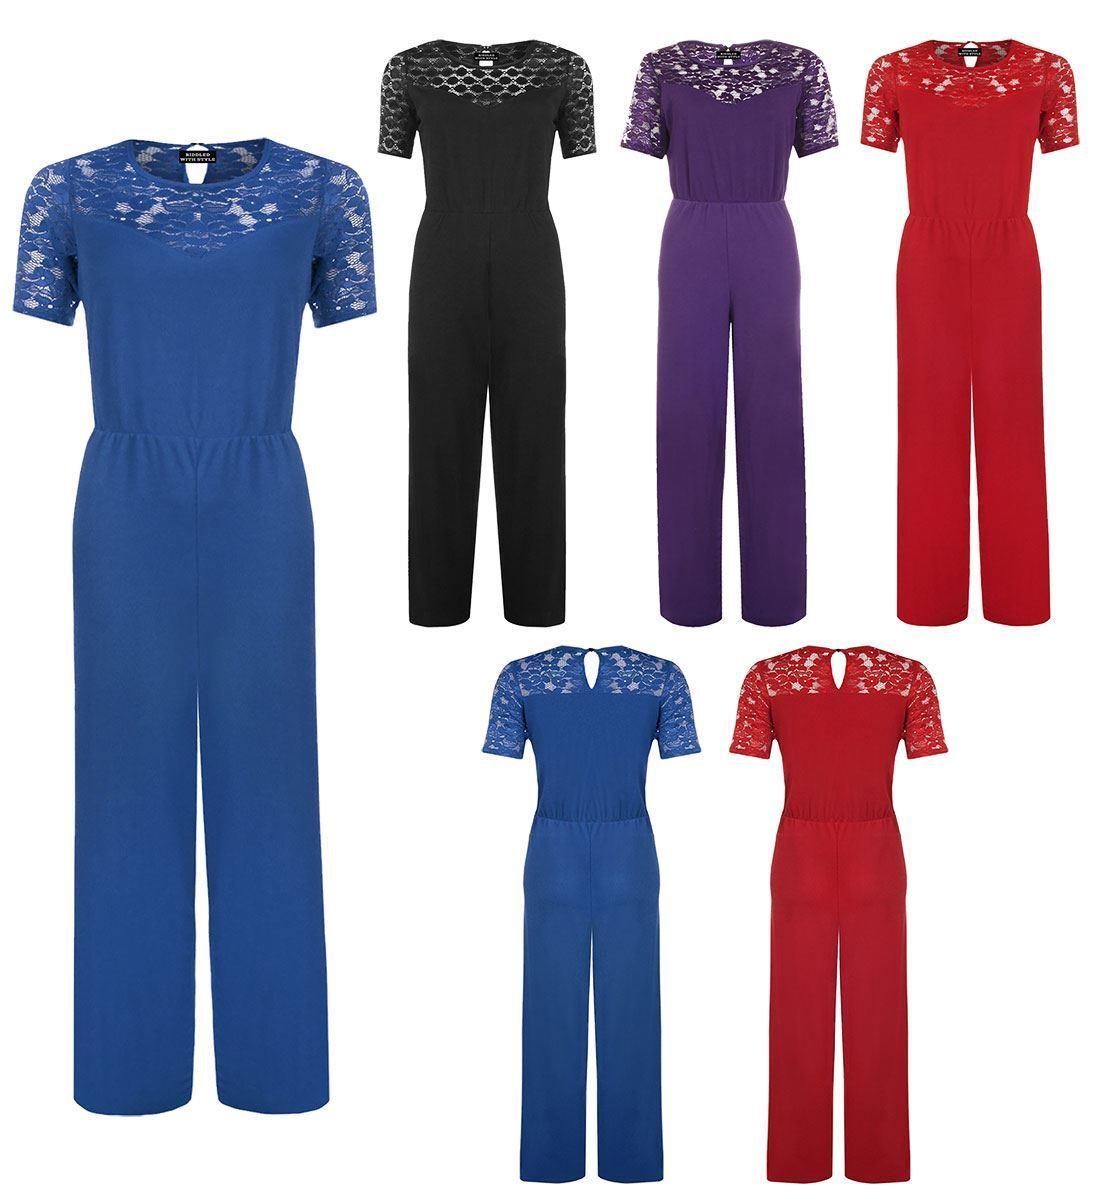 Womens Short Sleeve Lace Crochet Jumpsuit Ladies Wide Palazzo LegStyle Jumpsuit